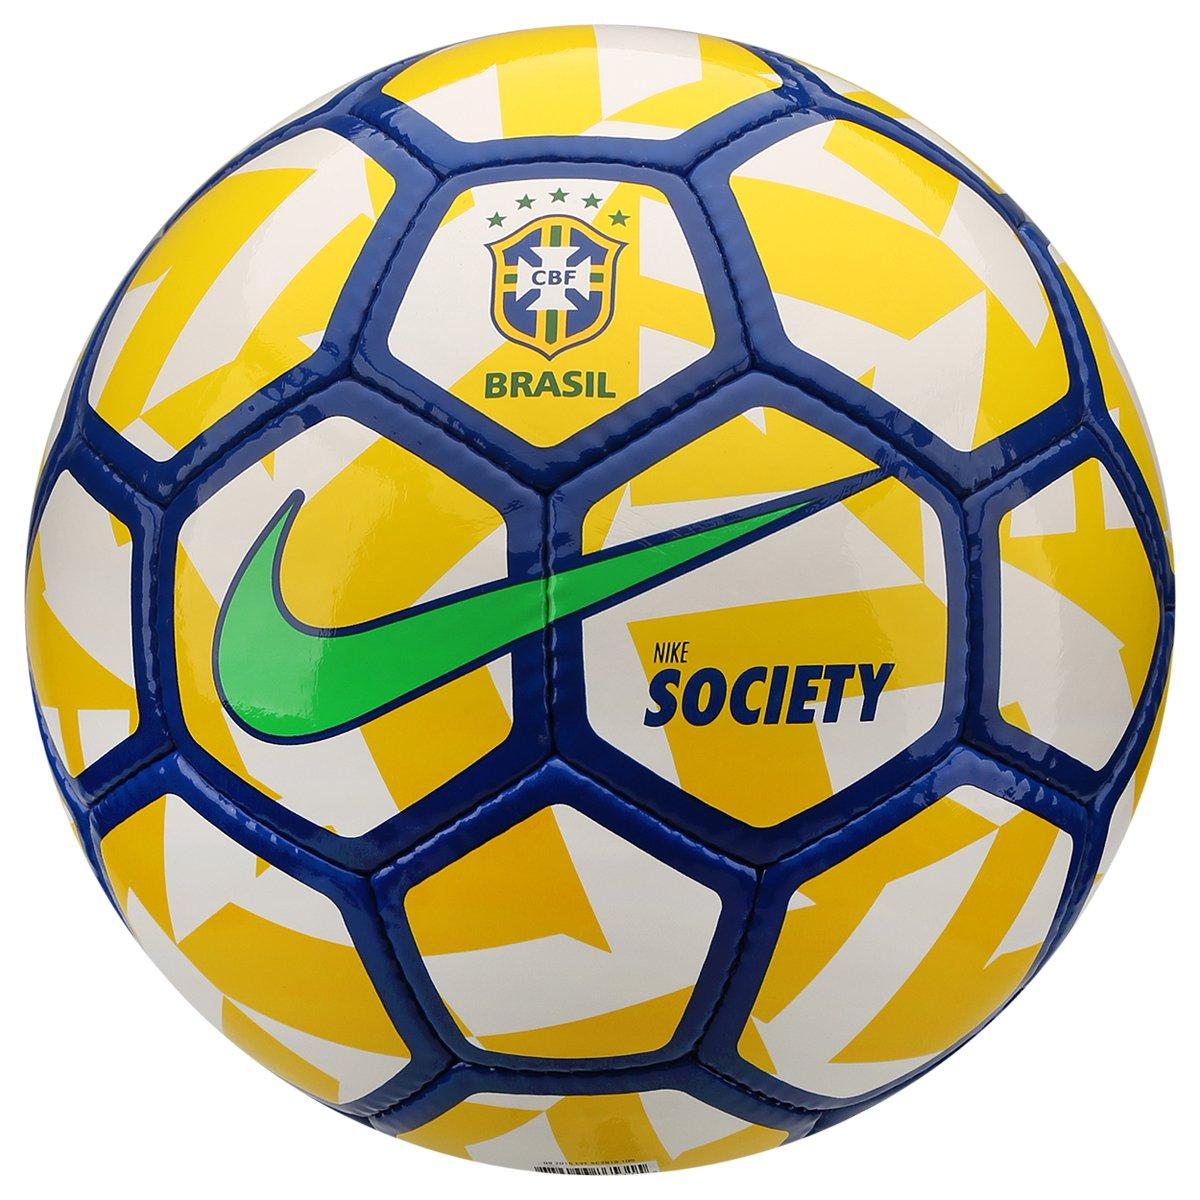 b5106cdb94 Bola Futebol Nike CBF Society | Shop Timão